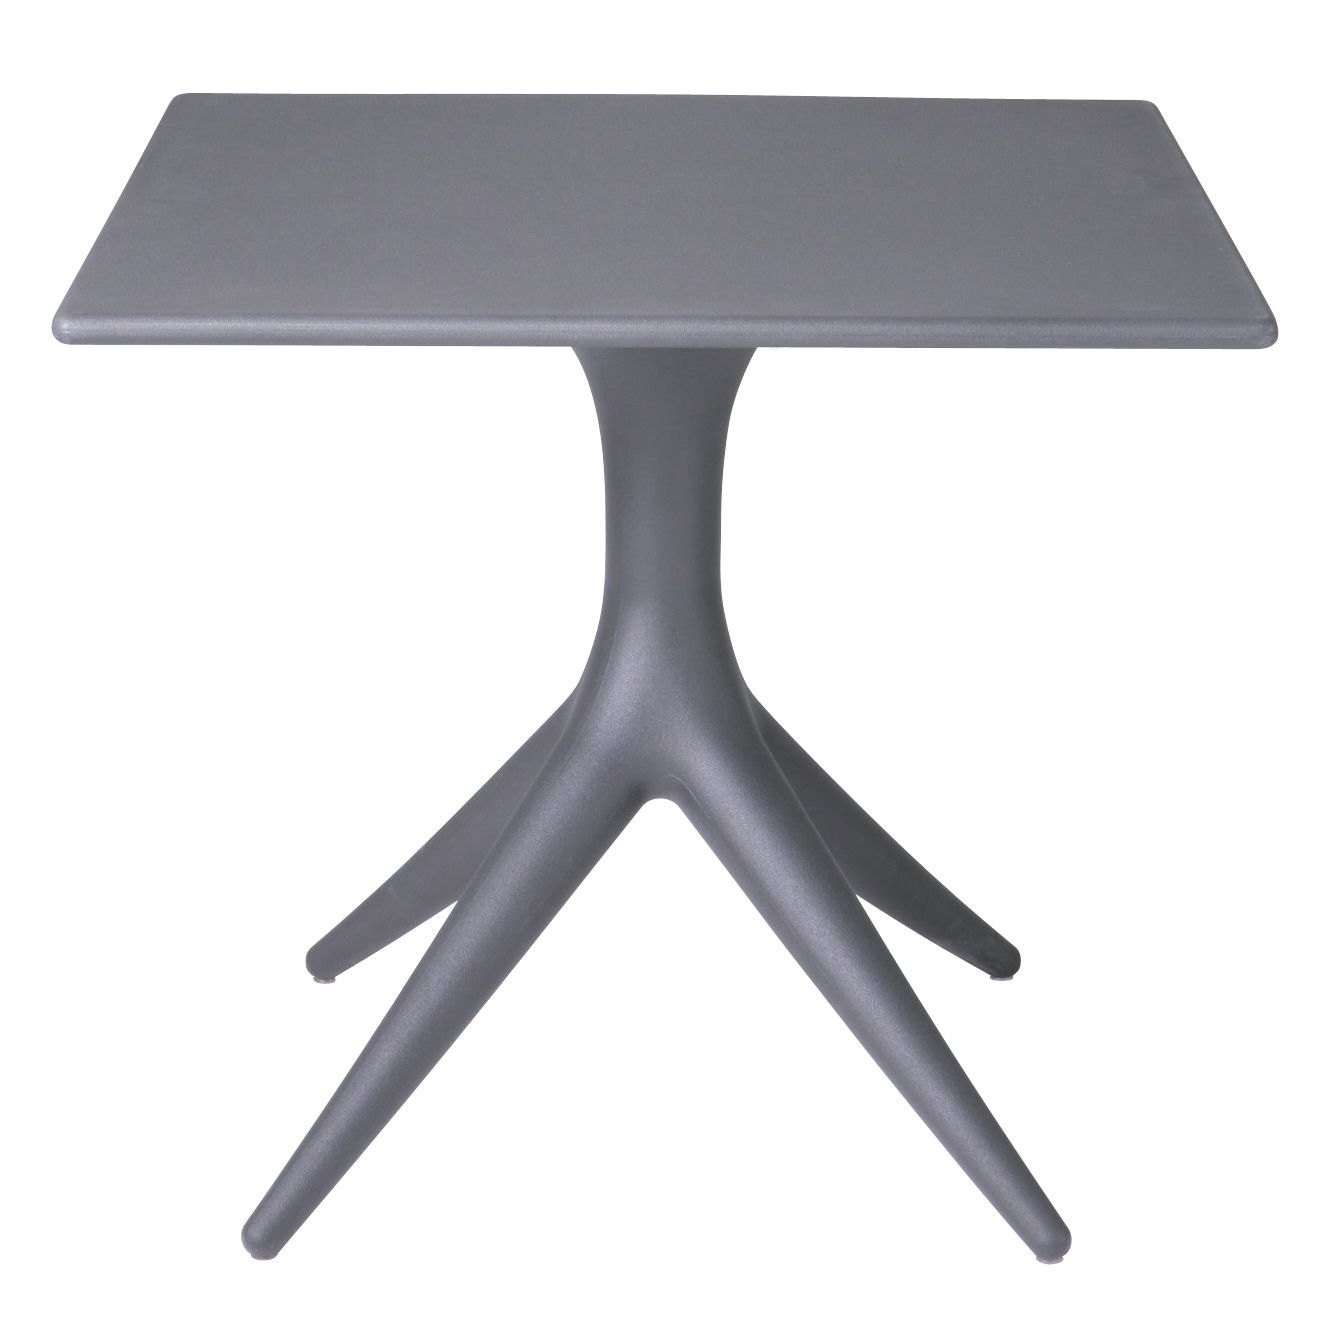 Outdoor - Tables de jardin - Table carrée App / 80 x 80 cm - Driade - Gris anthracite - Polyéthylène rotomoulé